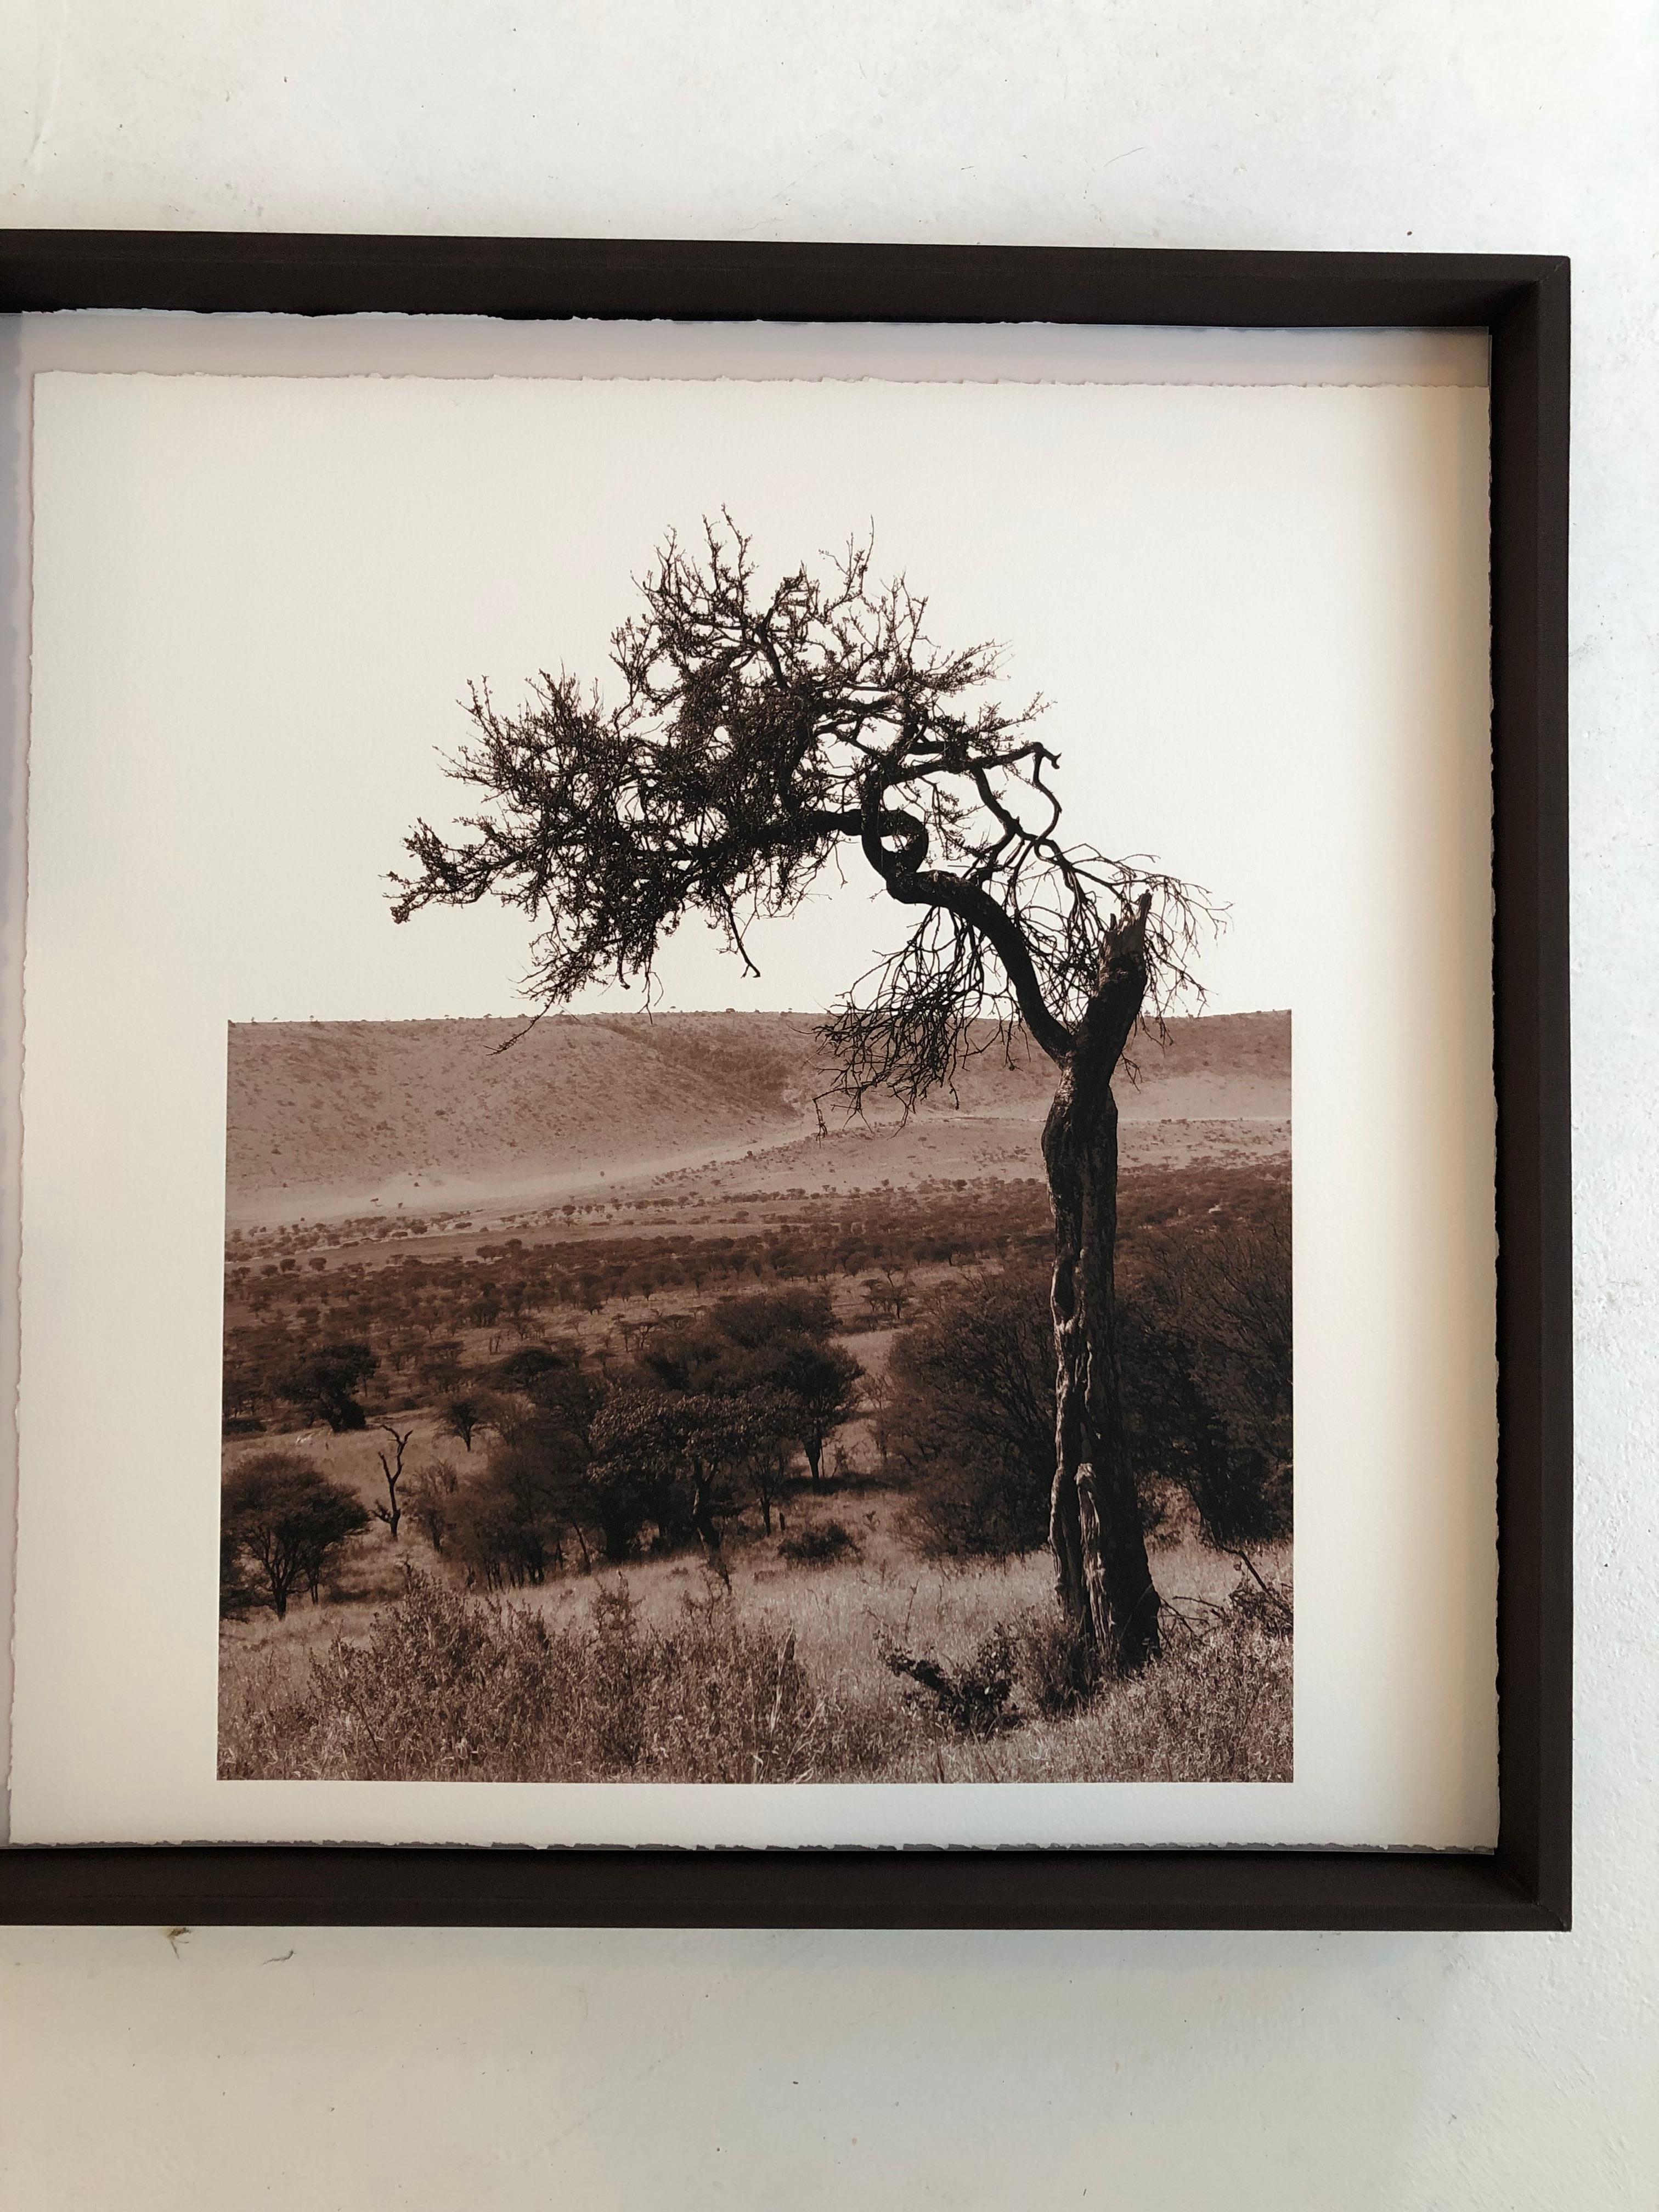 """African Tree series #4"" - Sepia Toned photograph of Serengeti tree"